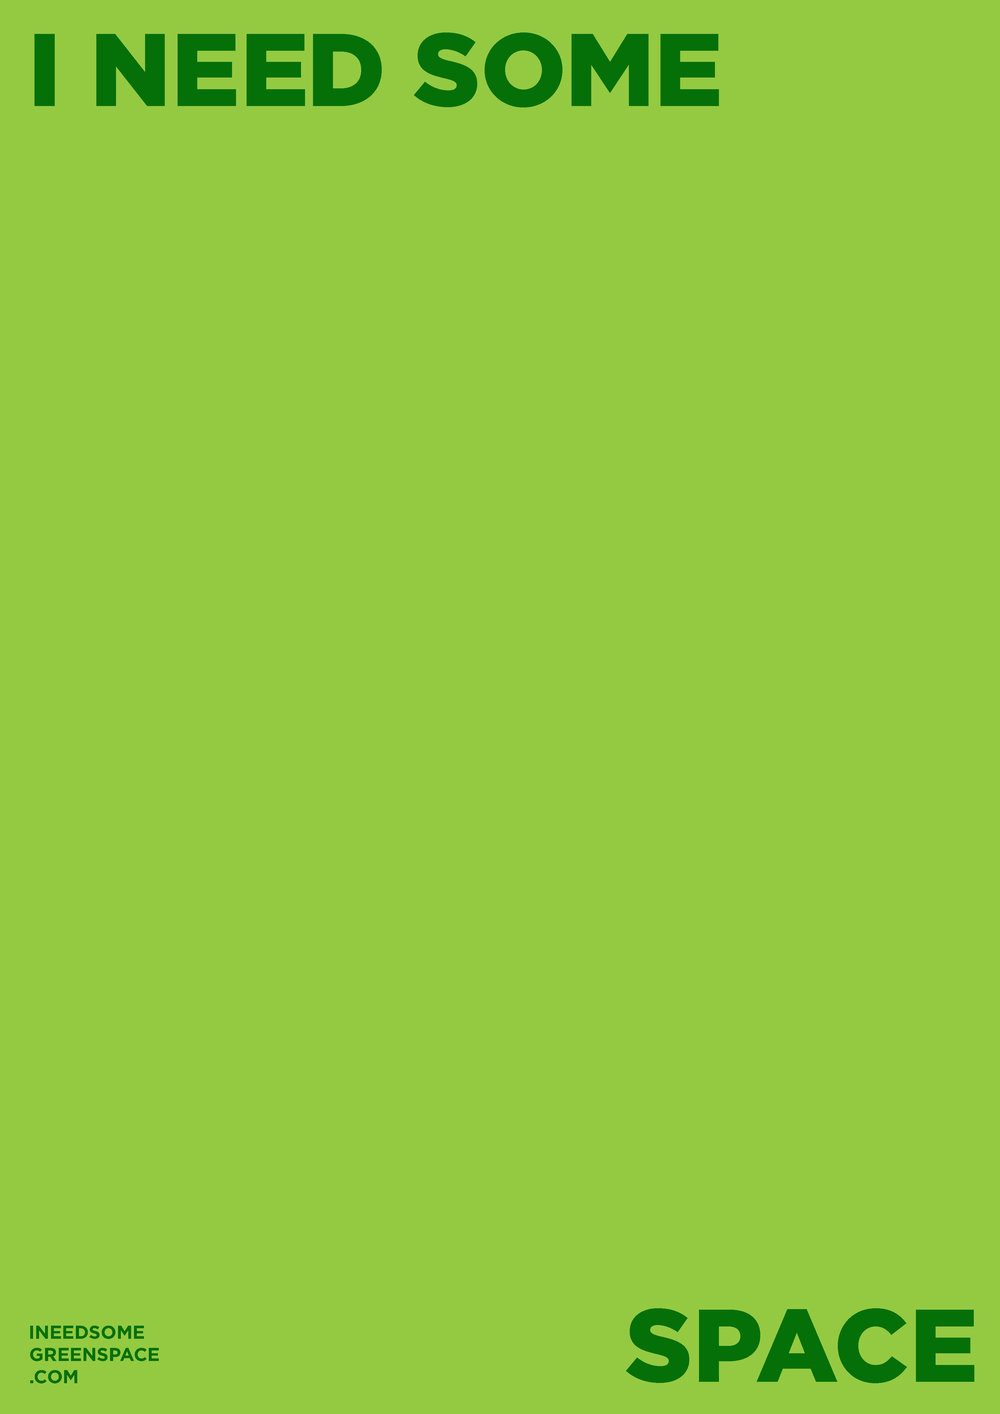 greenspace02